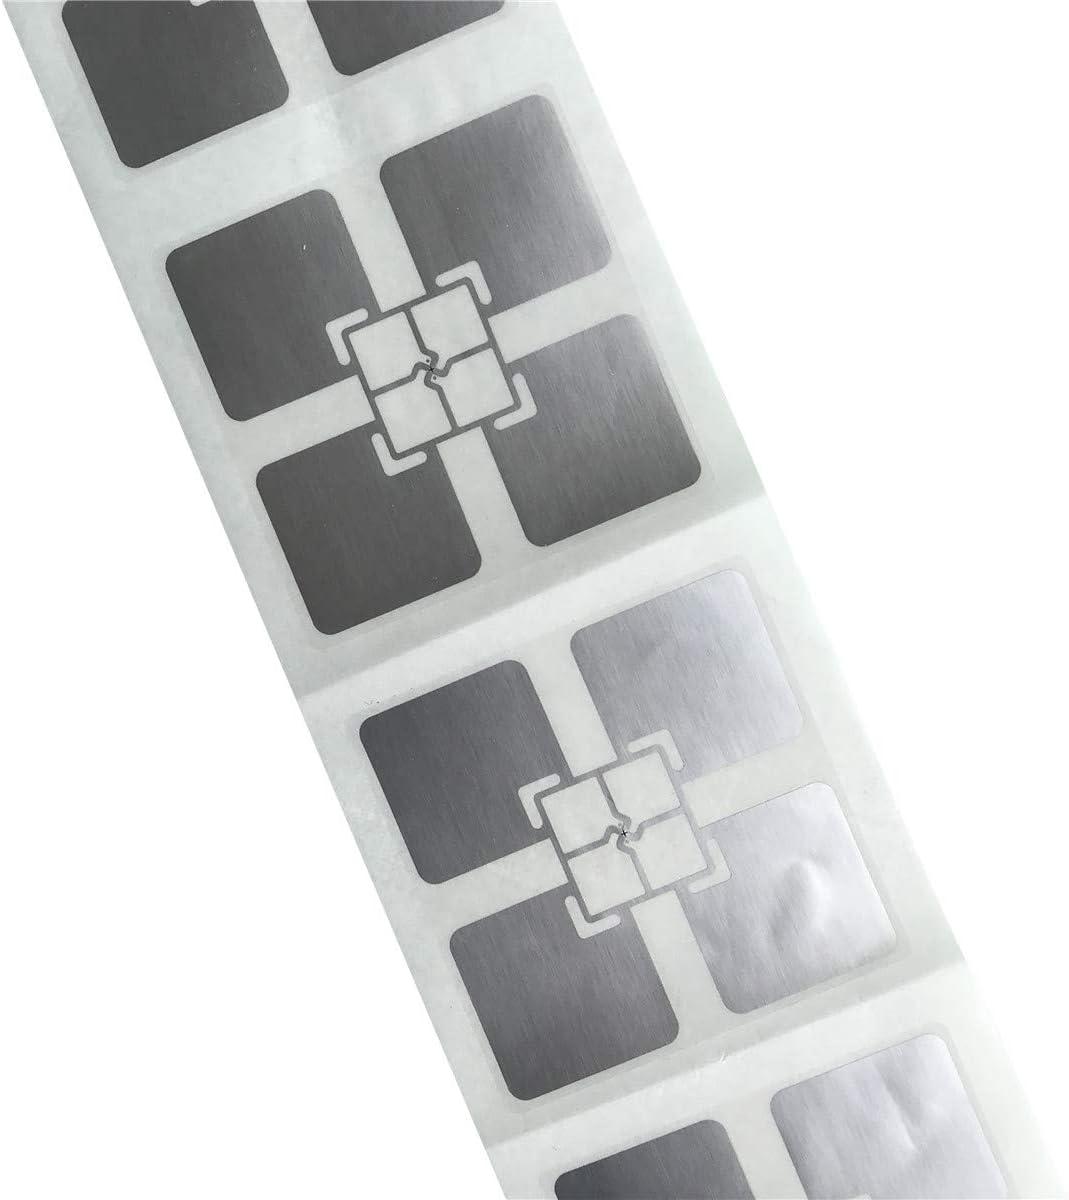 RFID uhf tag True 3D QTTM Long Reading Range 860~960MHZ Sticker (Pack of 20)